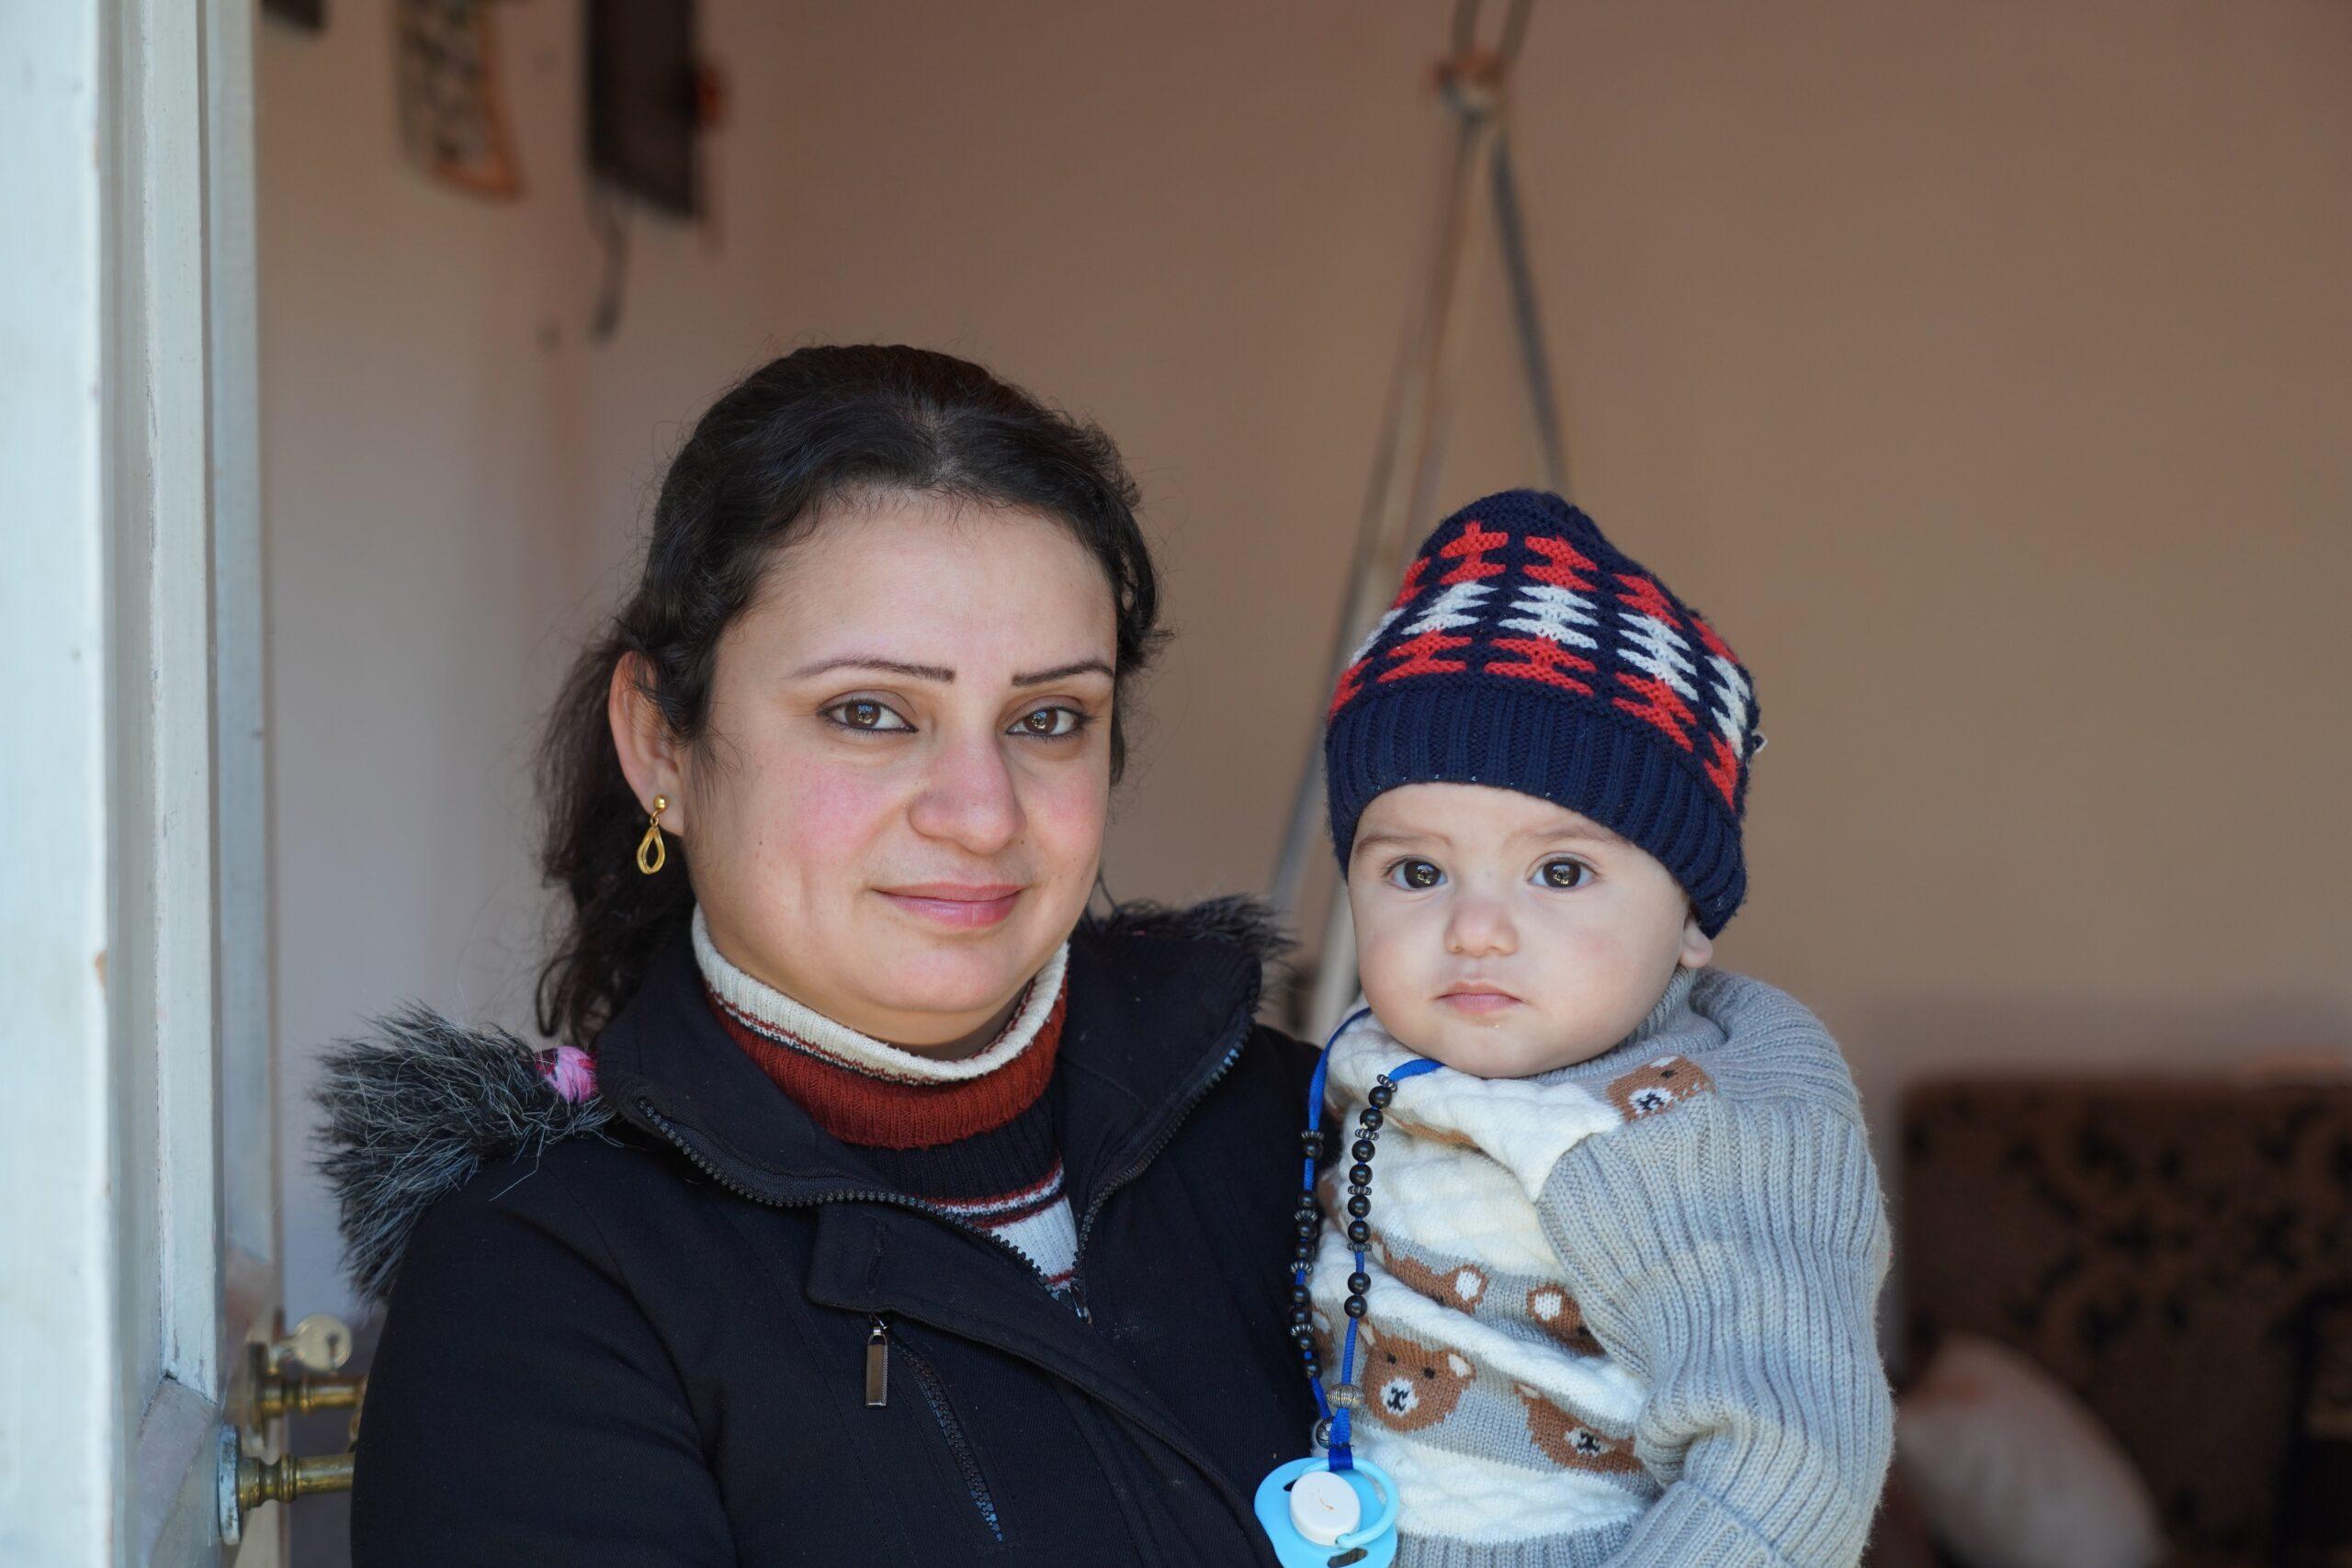 woman smiling holding little boy in winter hat